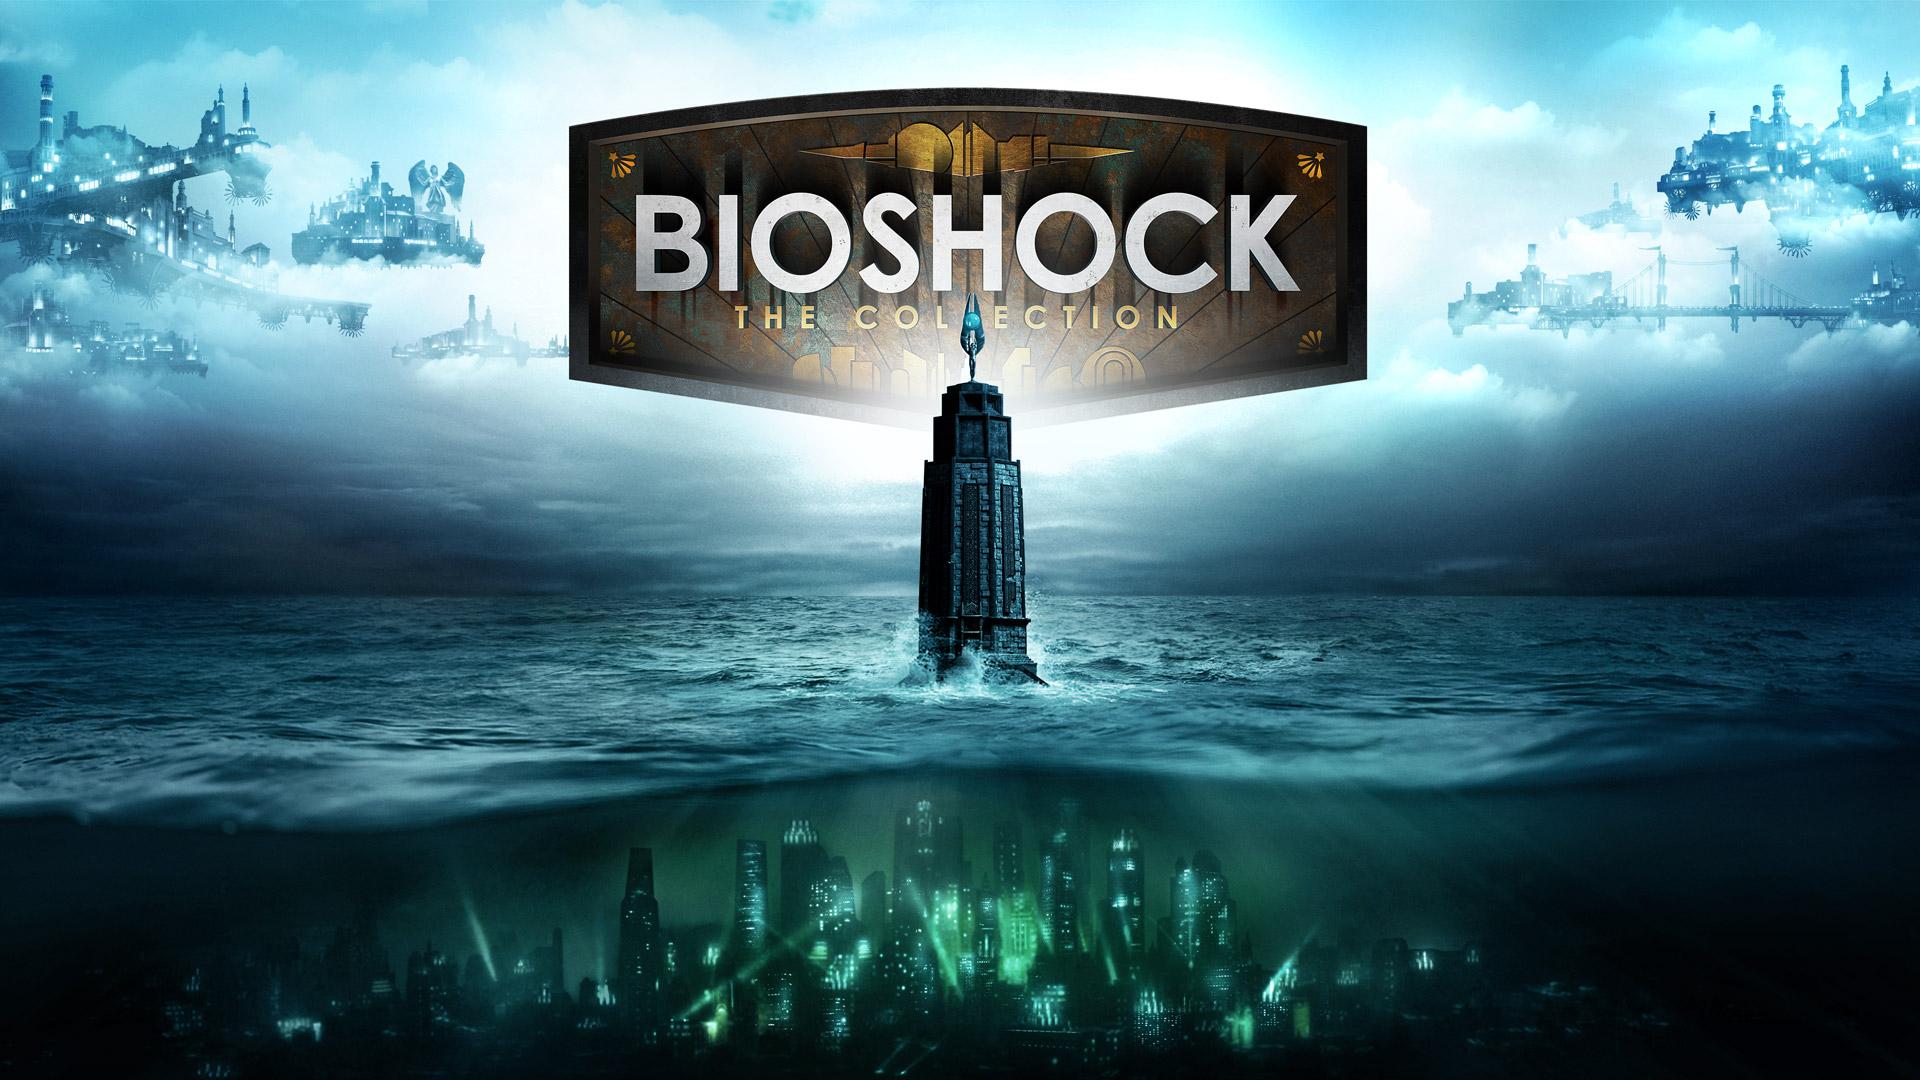 Nintendo eshop: BioShock: The Collection Eshop